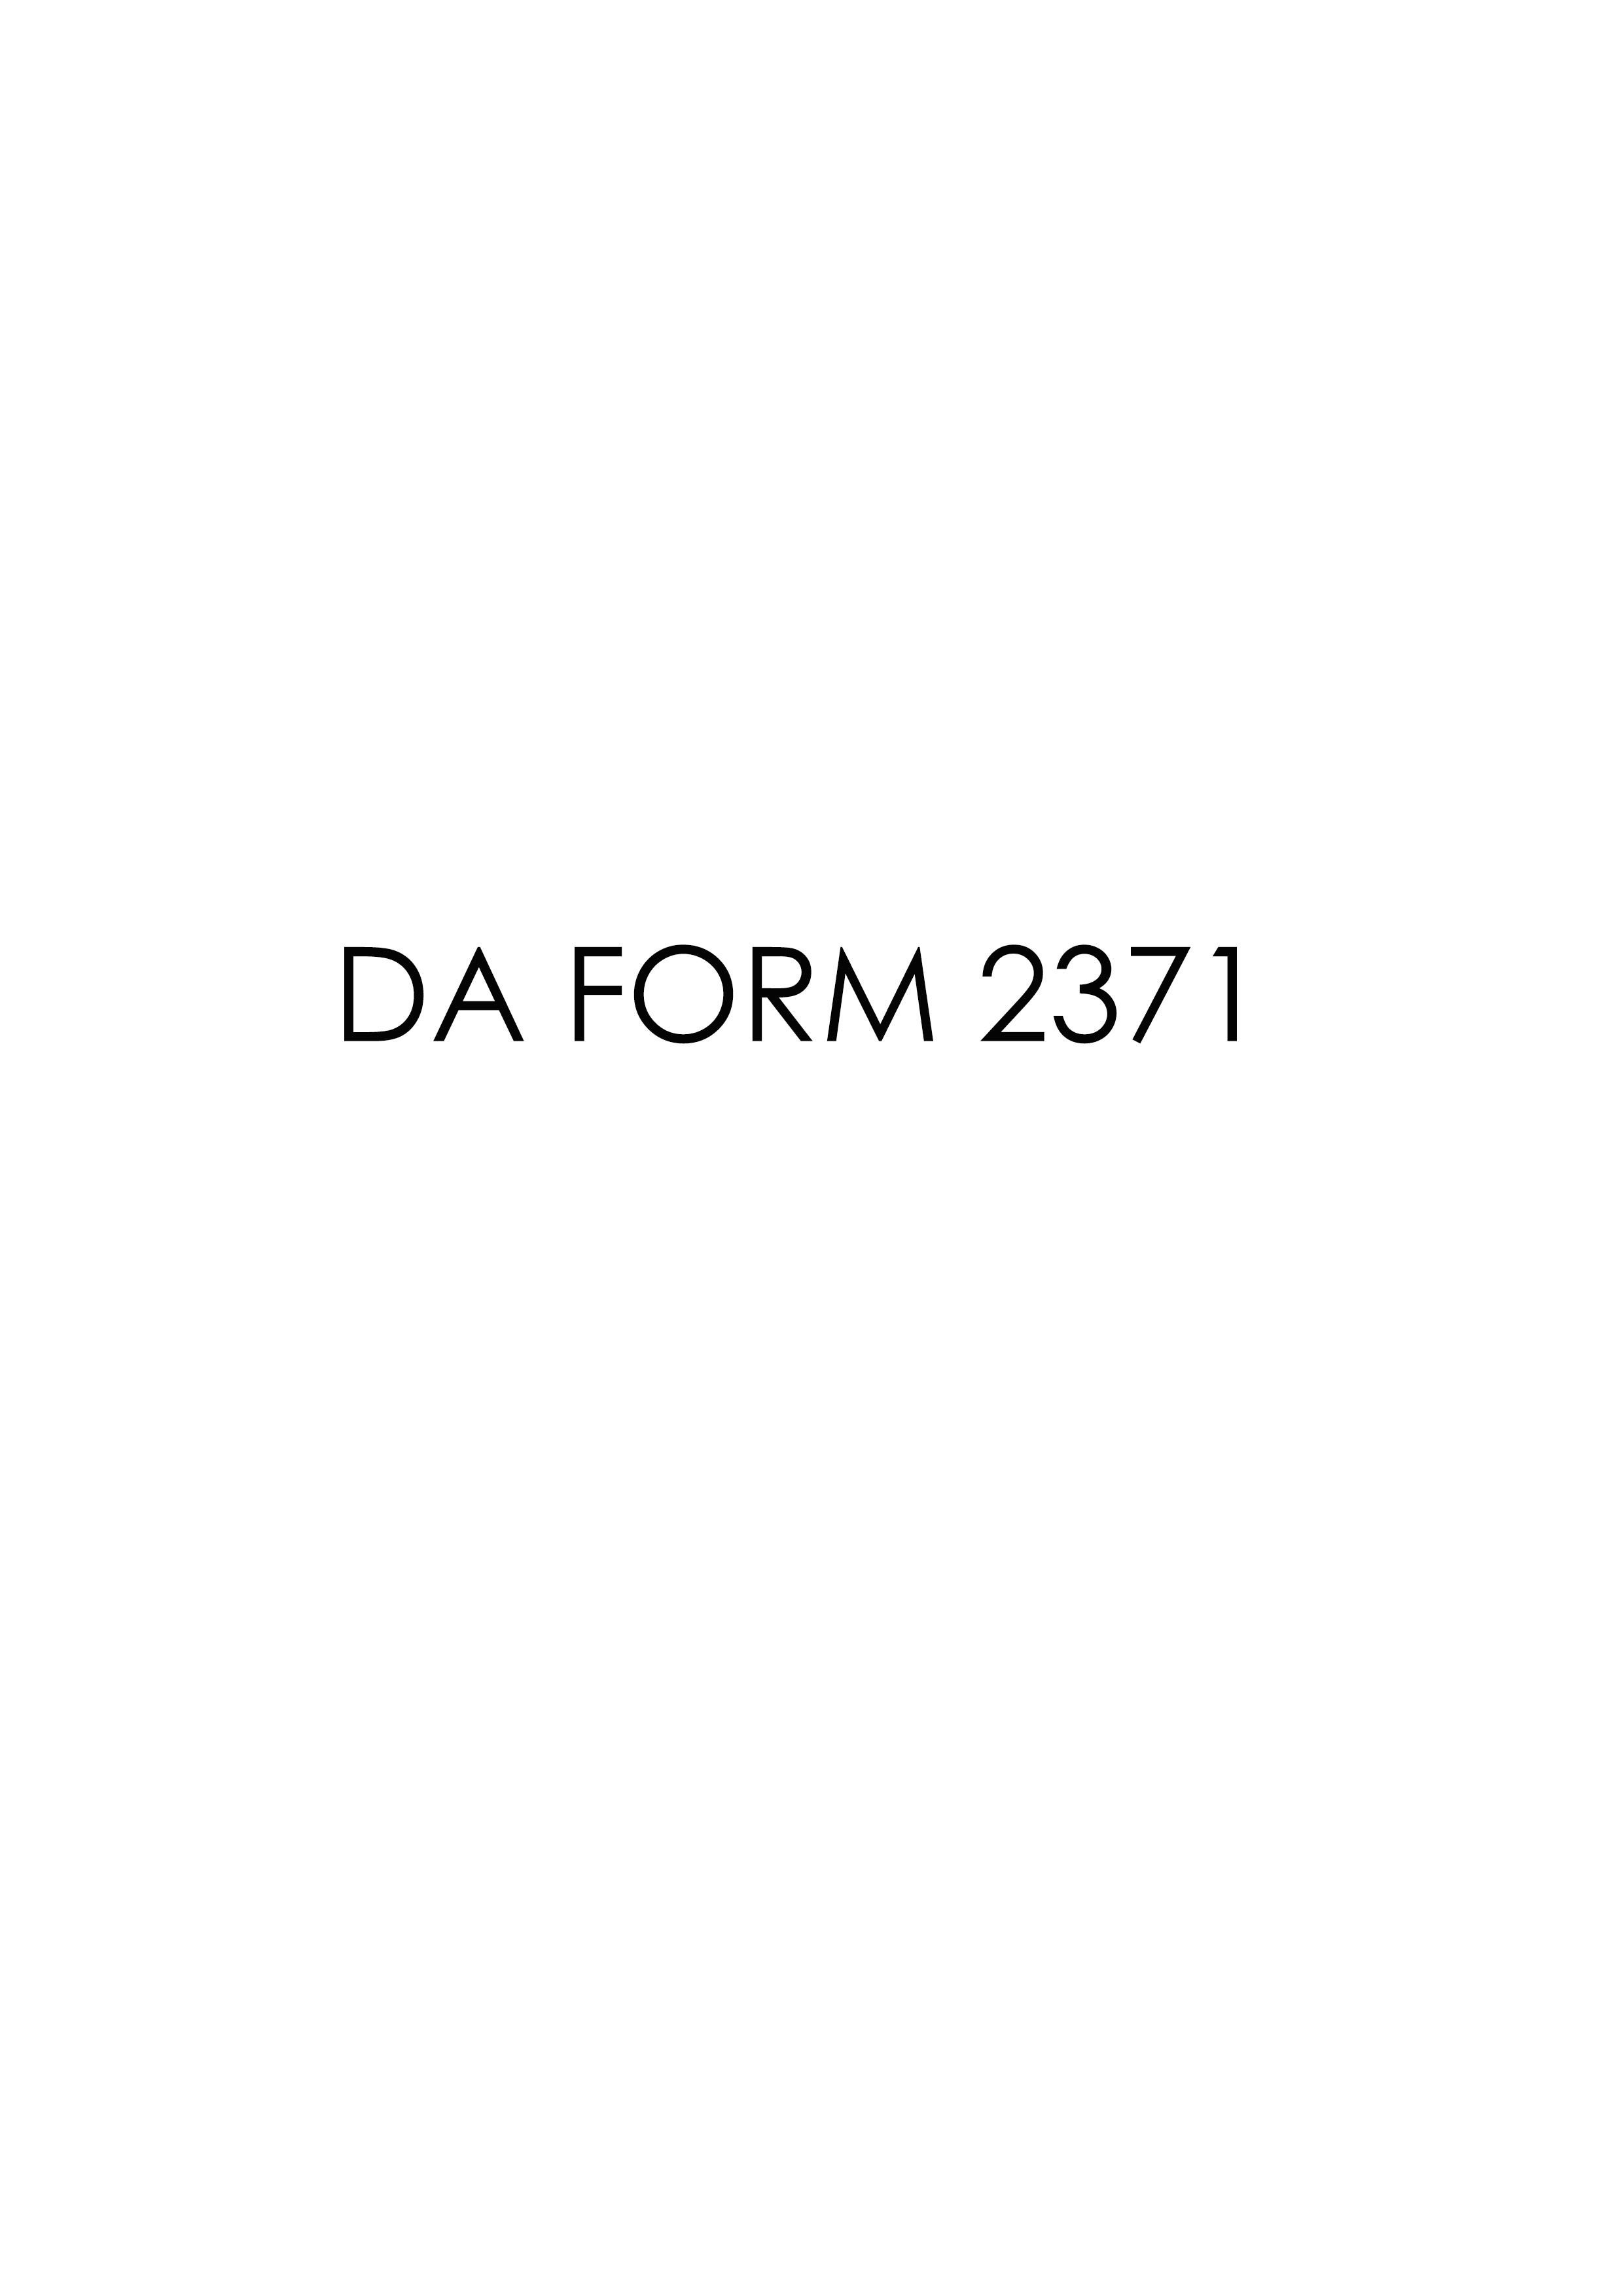 Download da Form 2371 Free